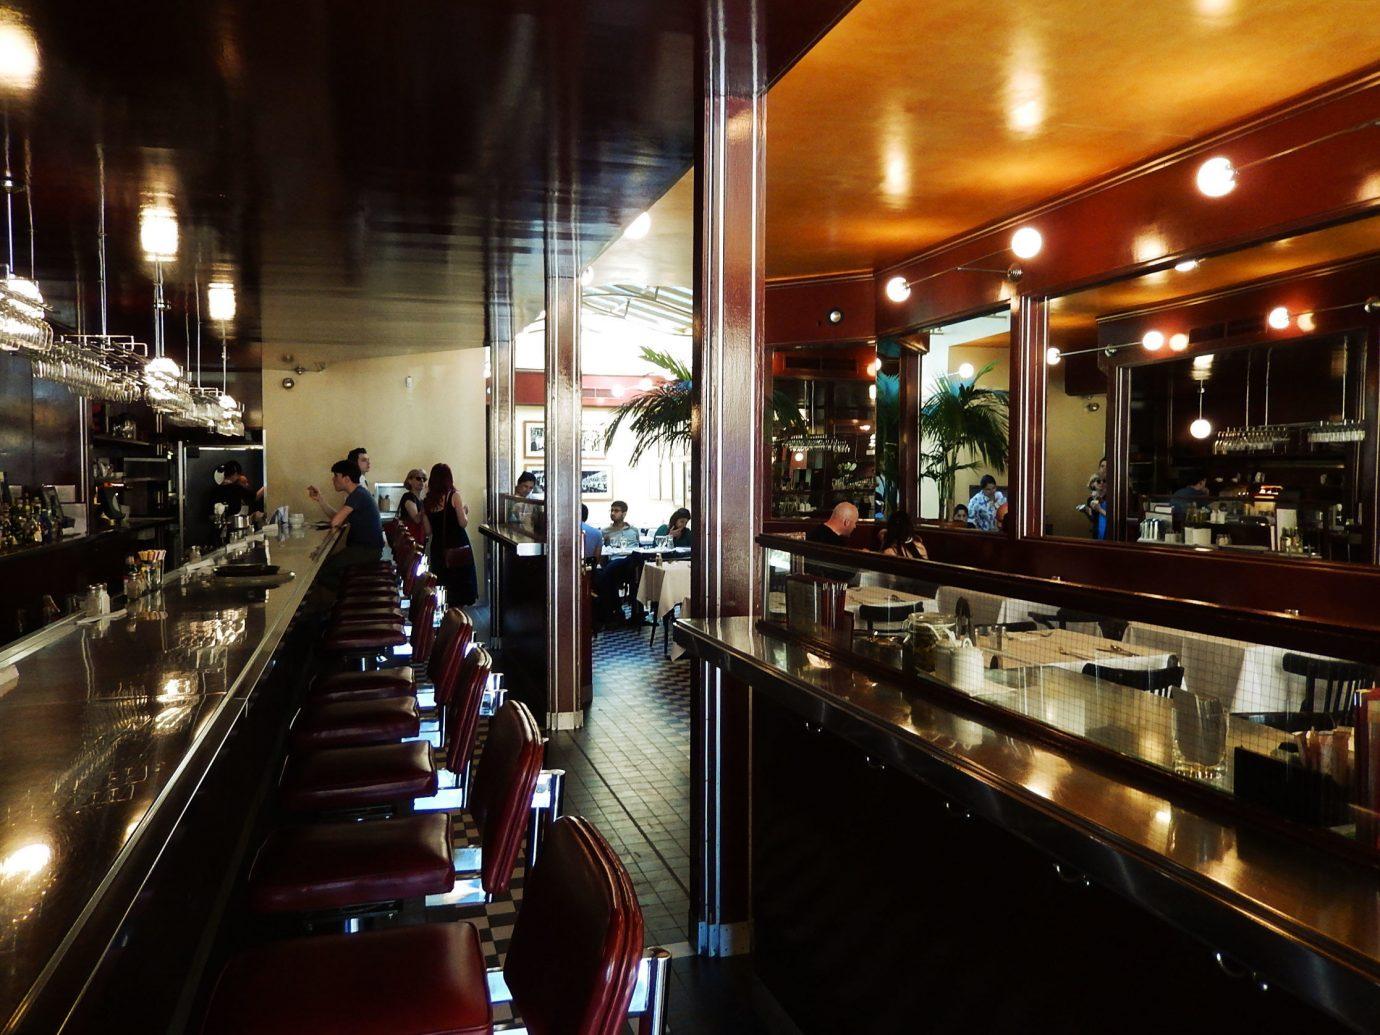 Trip Ideas building ceiling Bar restaurant night meal